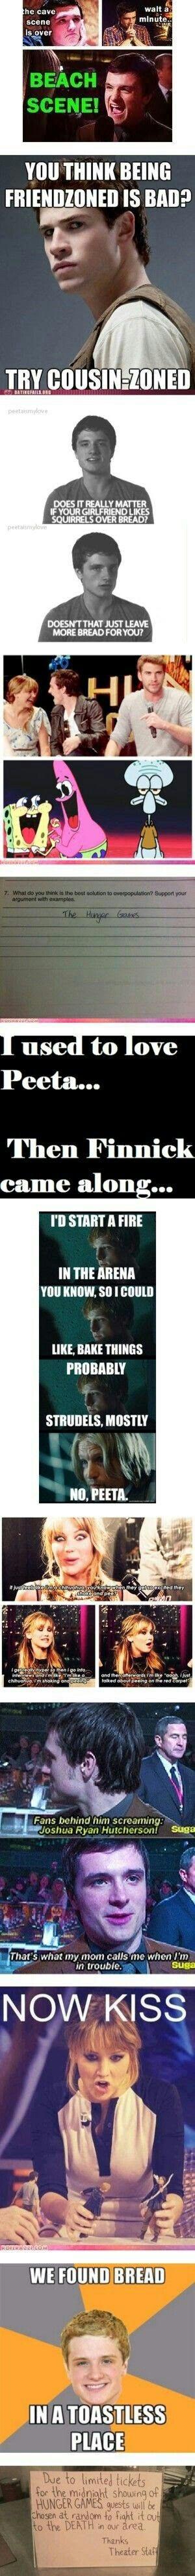 Well I like finnick but I still Love Peeta more